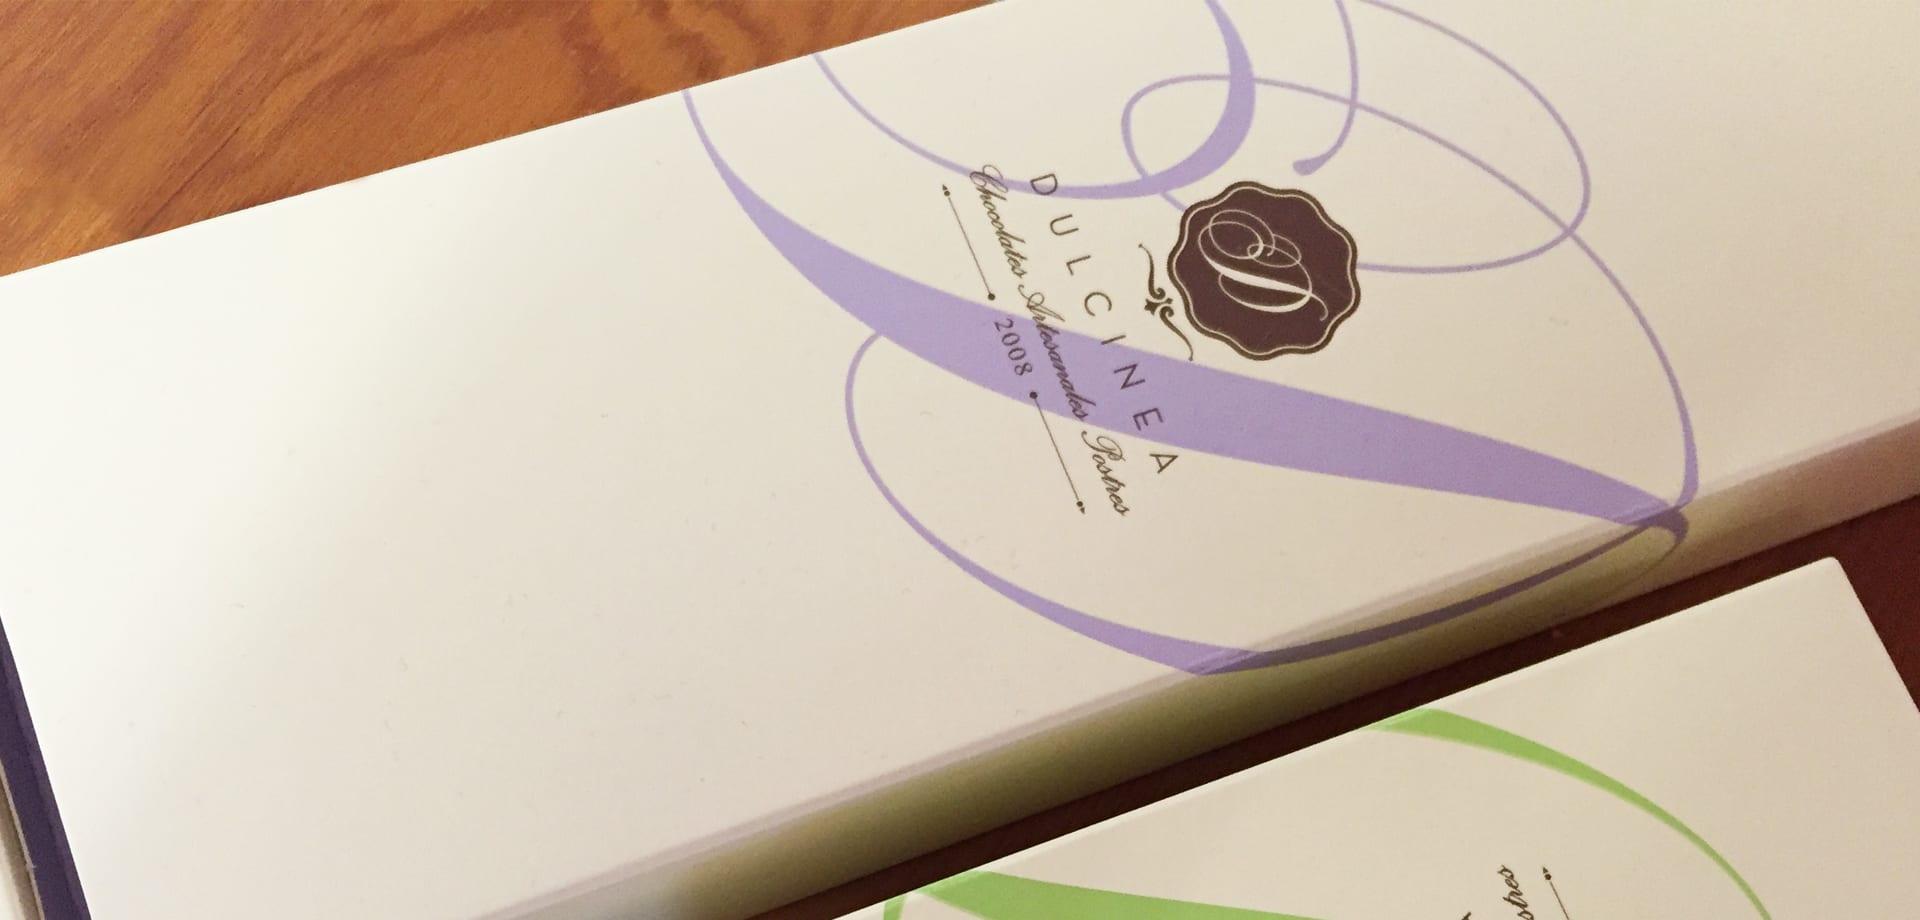 Dulcinea chocolate packaging